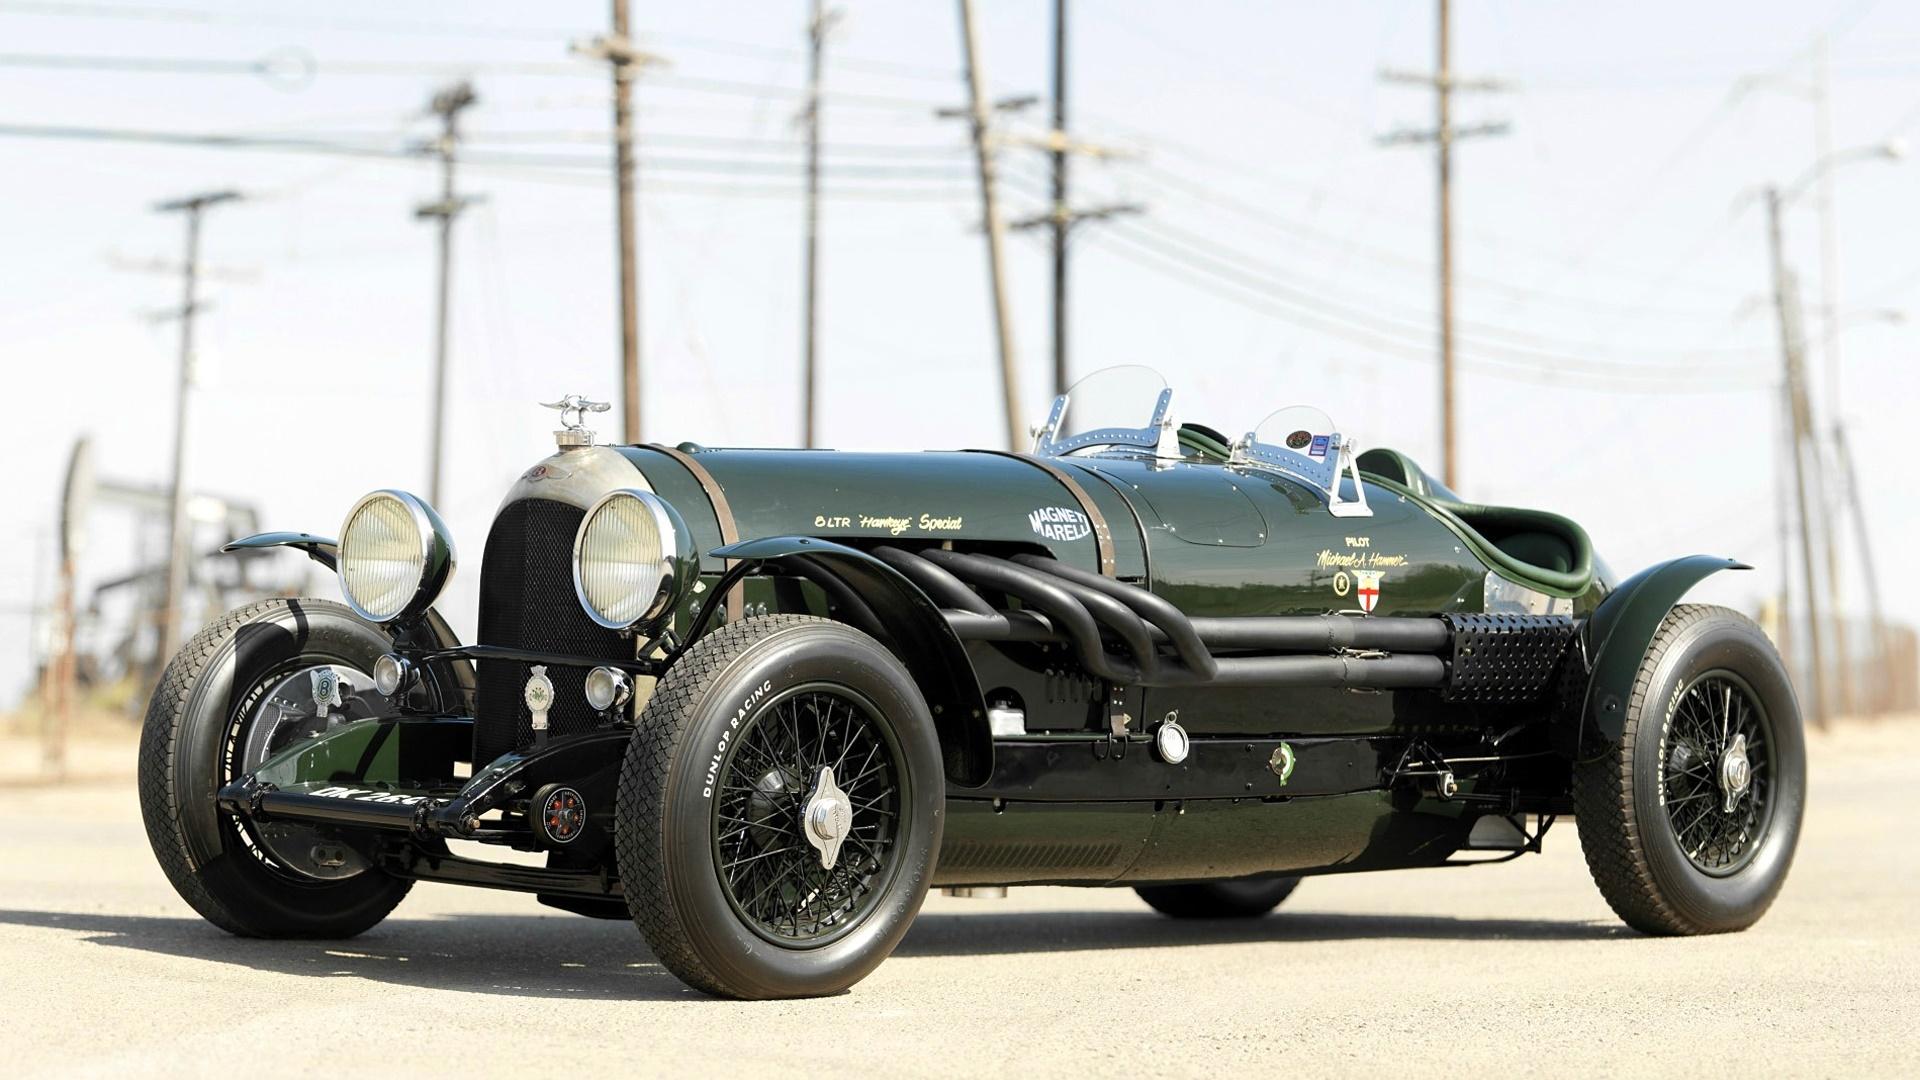 1924 Bentley 3/8 Litre Hawkeye Special wallpaper